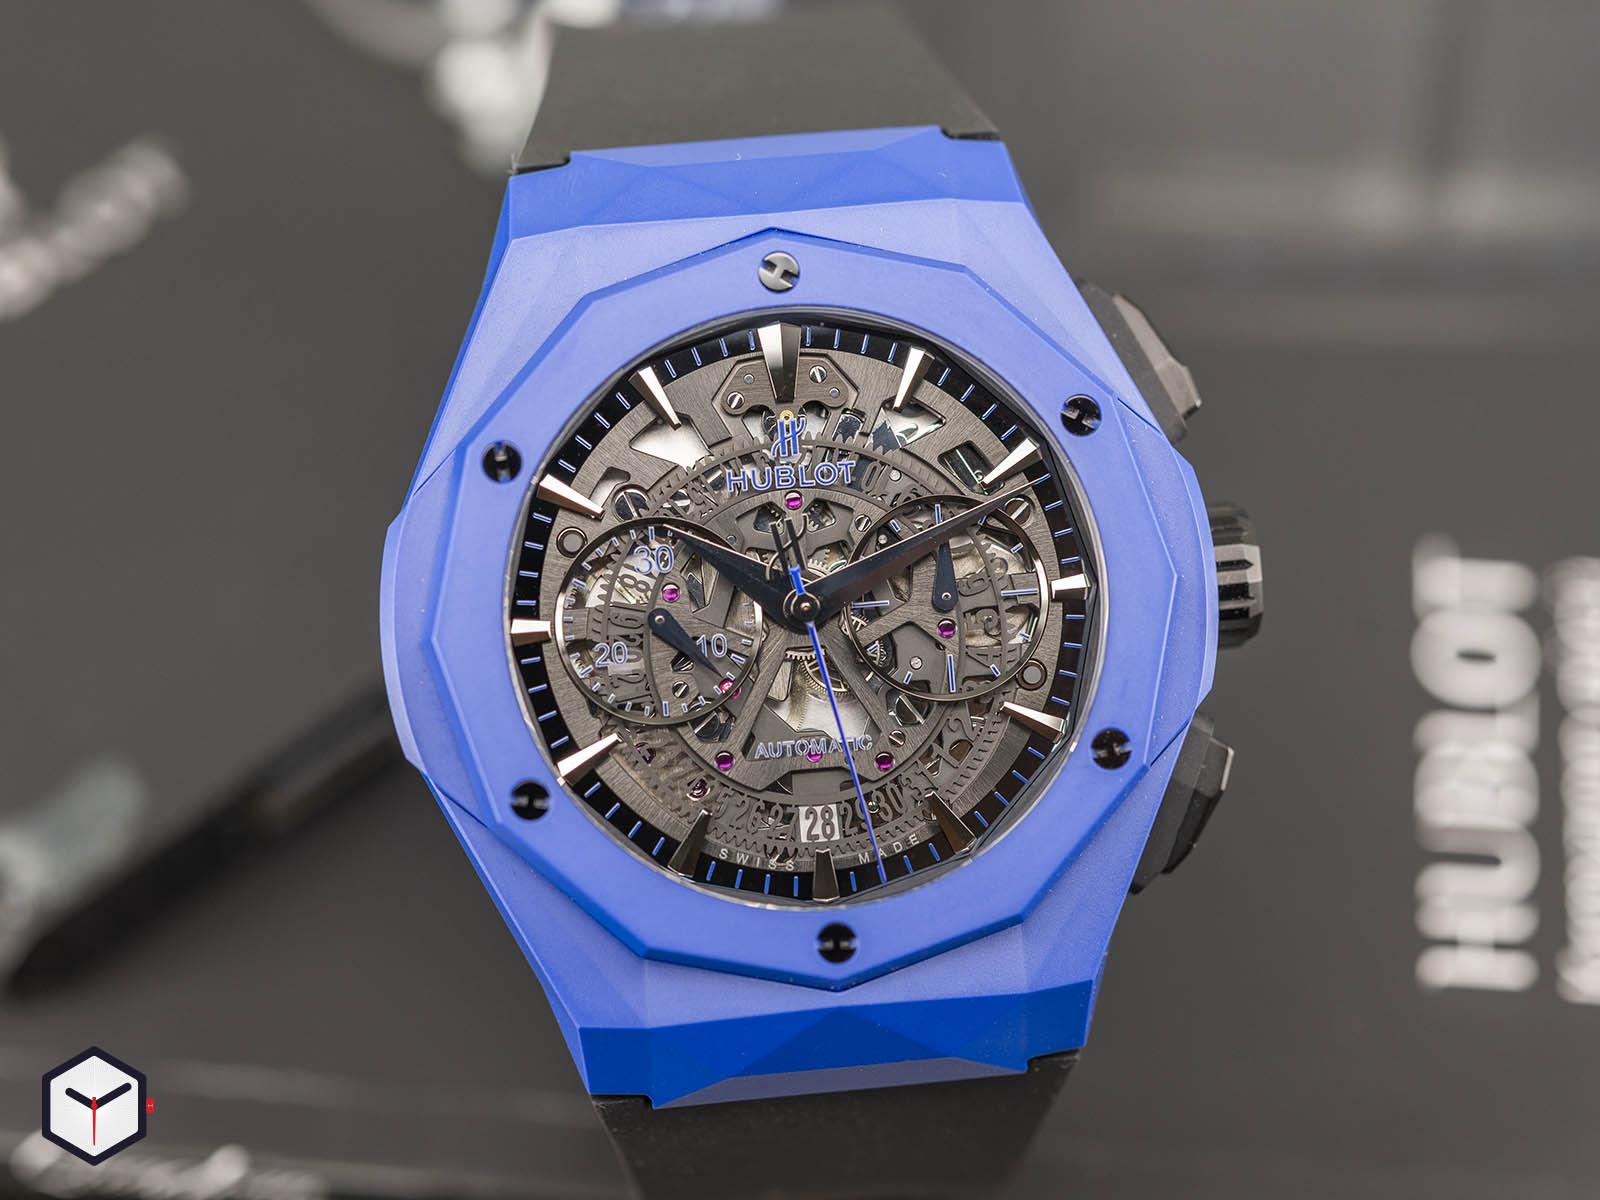 525-ex-0179-rx-orl18-hublot-aerofusion-chronograph-orlinski-blue-ceramic-2.jpg